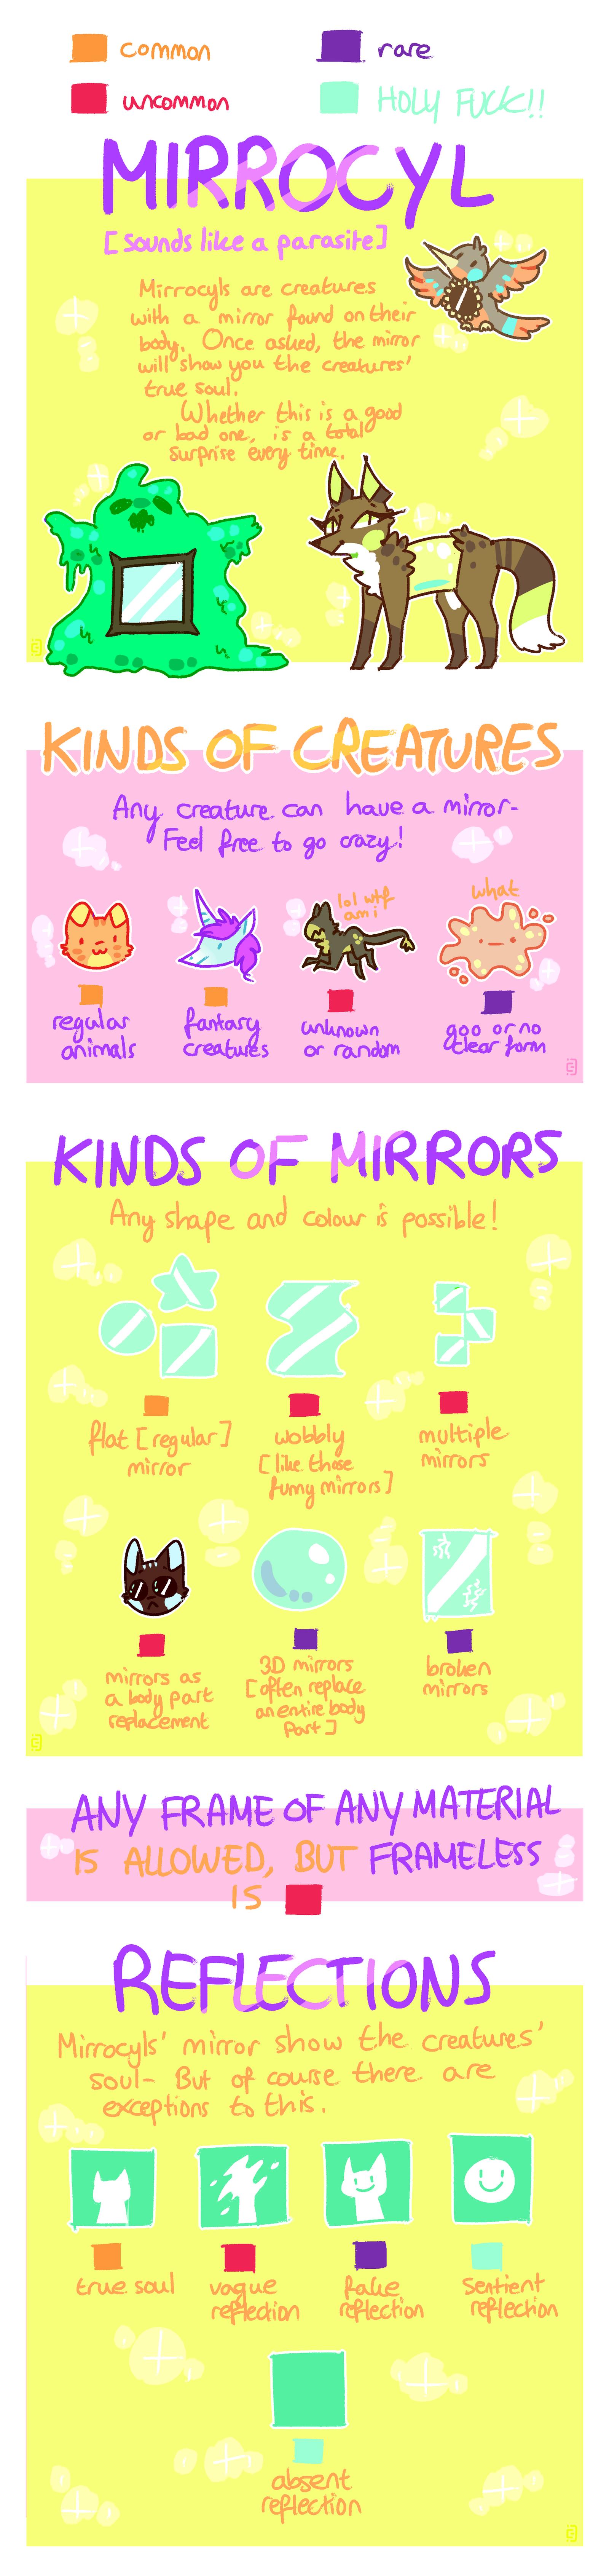 [OPEN SPECIES] MIRROCYL. by Syrinq